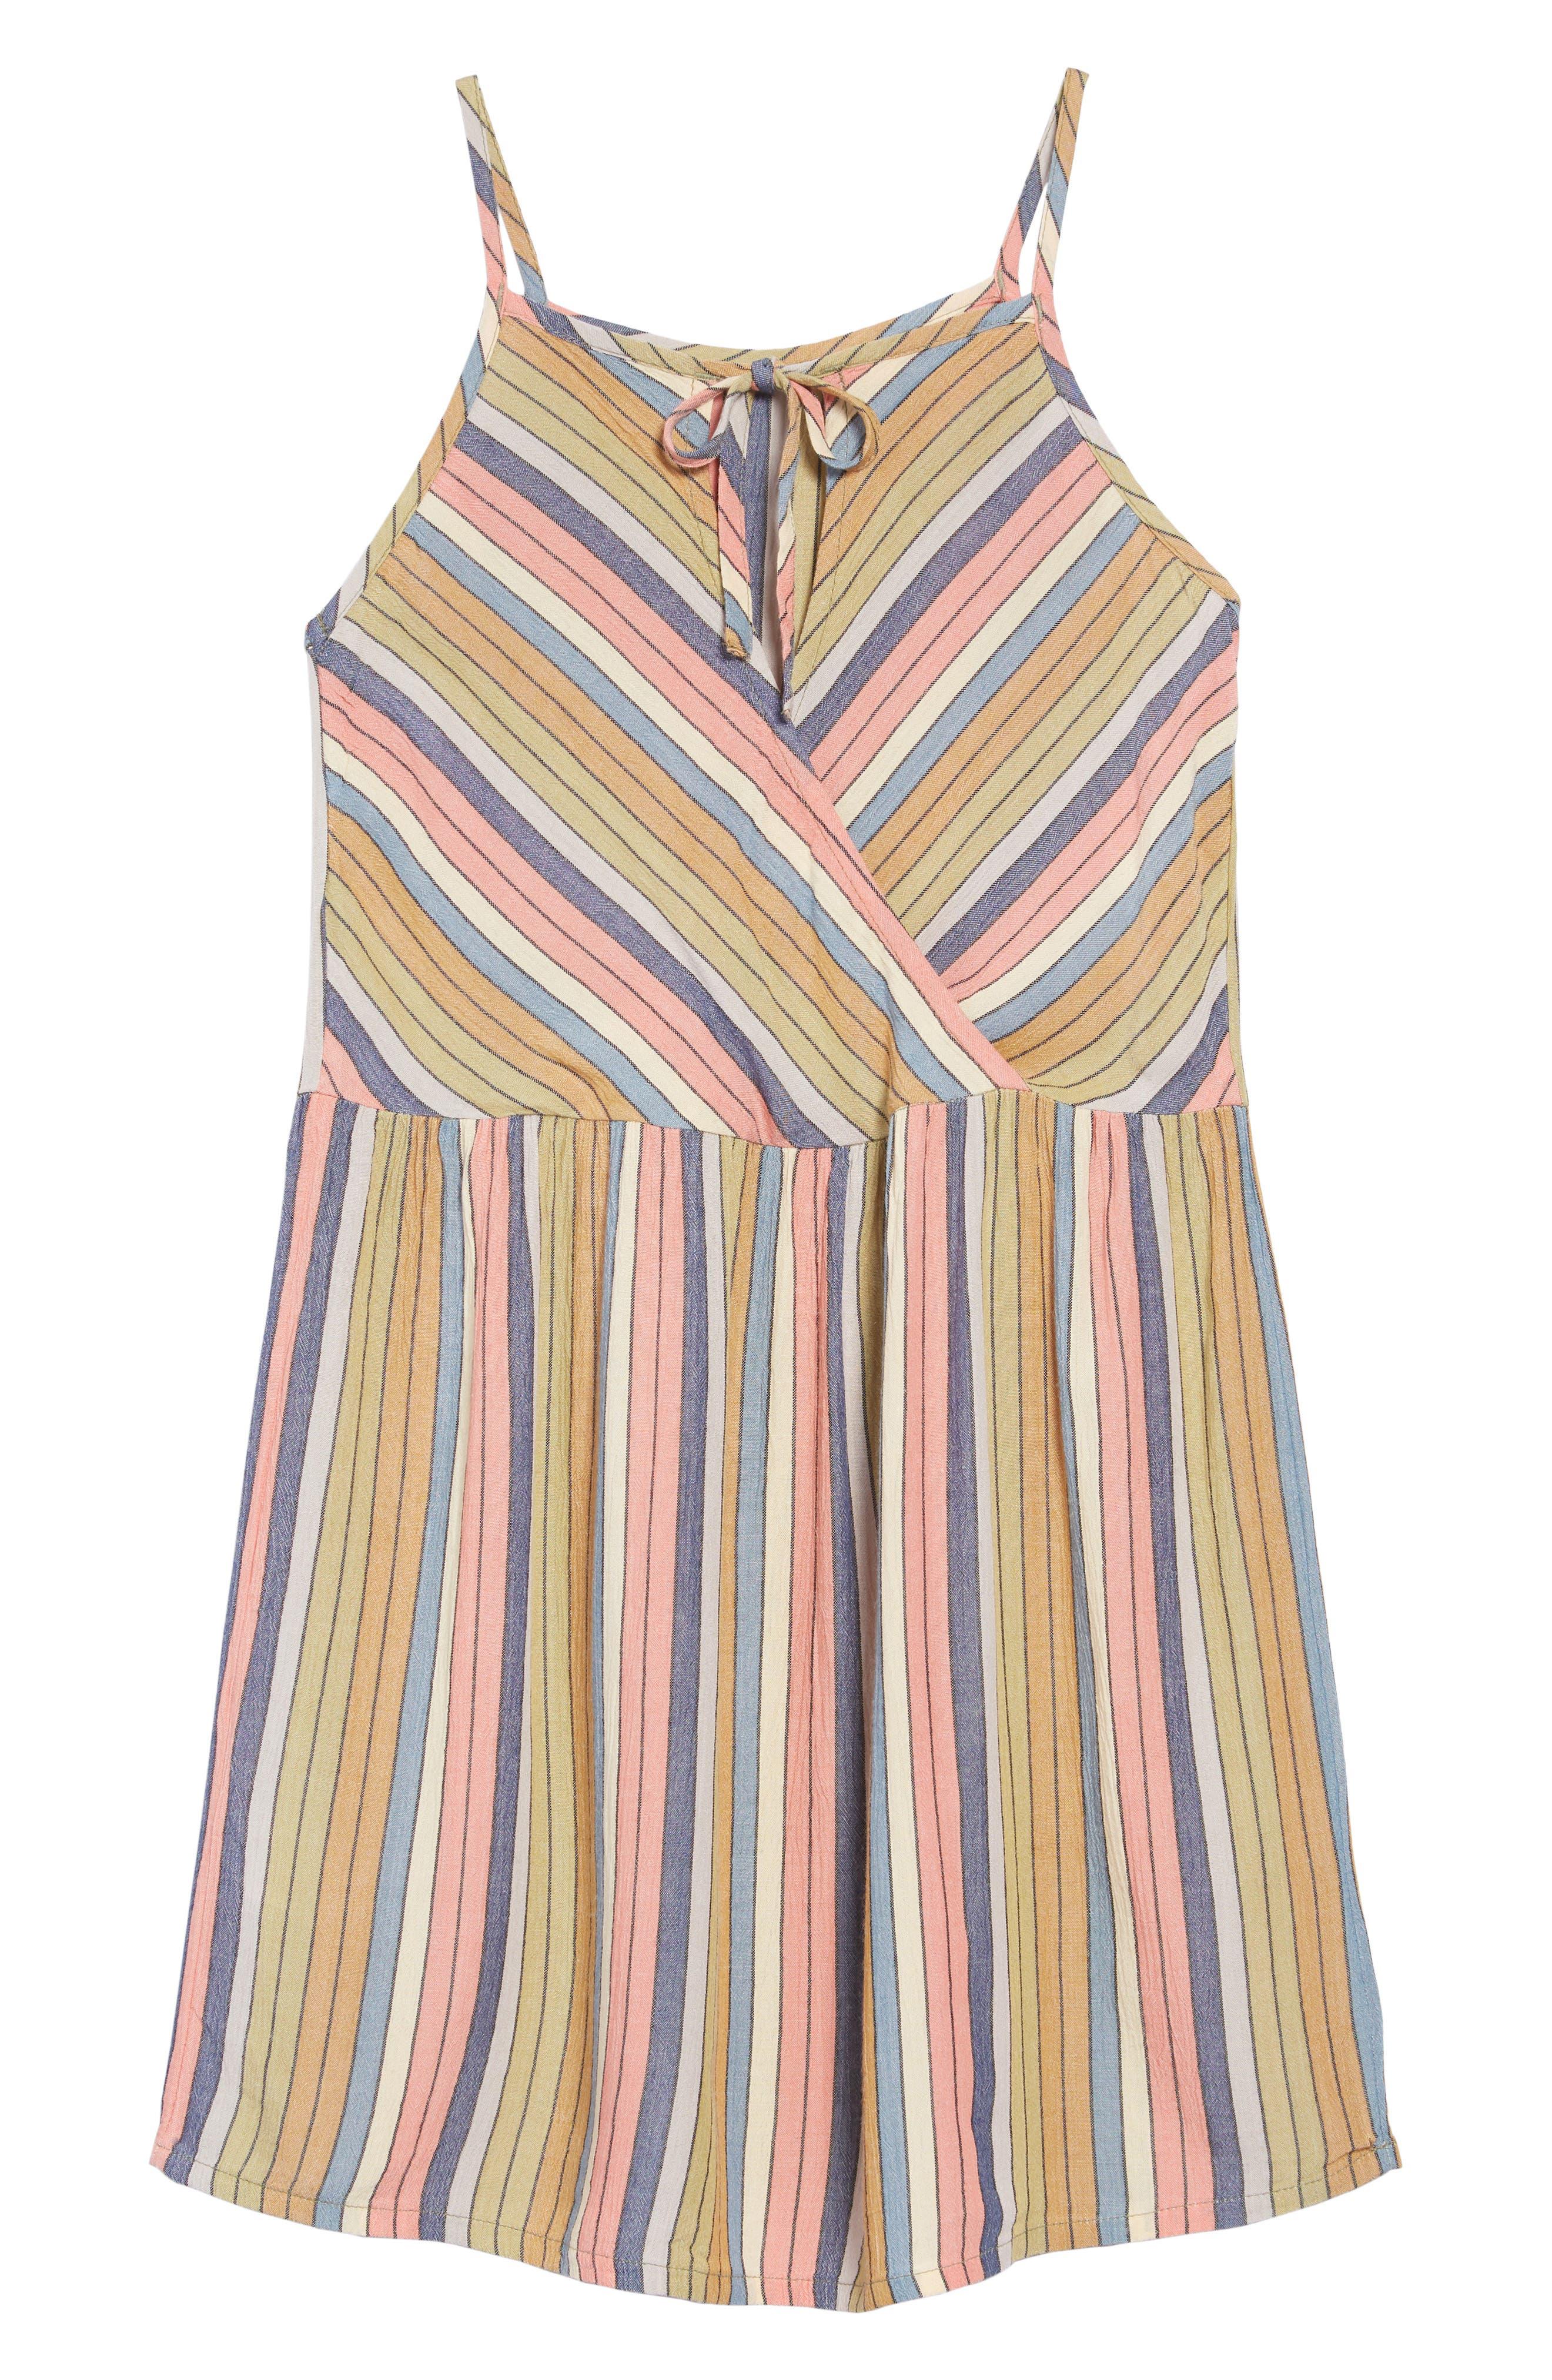 O'NEILL,                             Berlin Stripe Sundress,                             Alternate thumbnail 4, color,                             MULTI COLORED